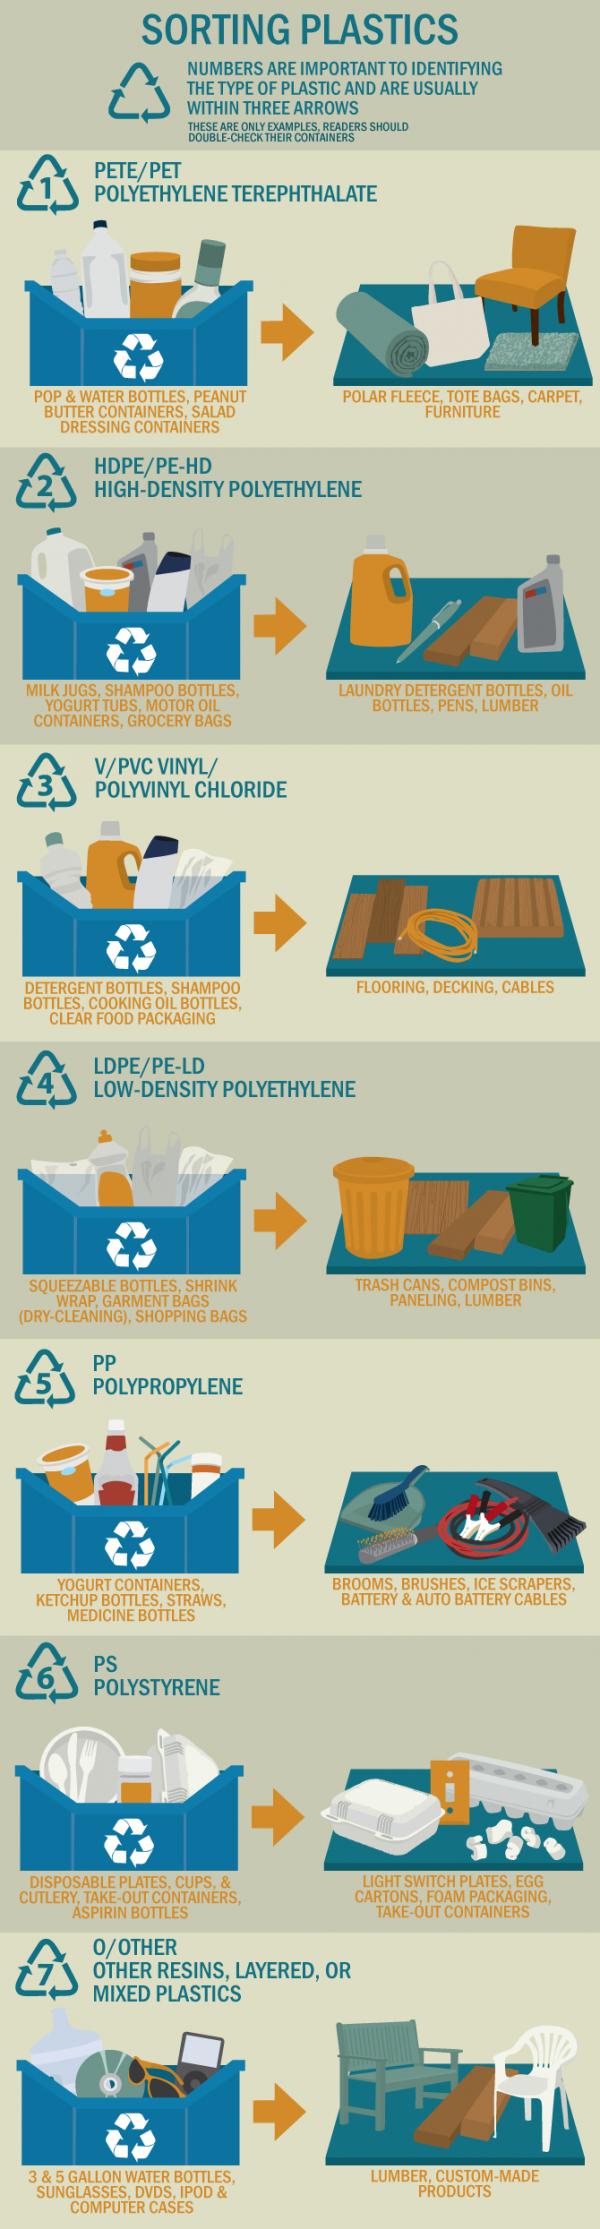 3 Sorting Plastics